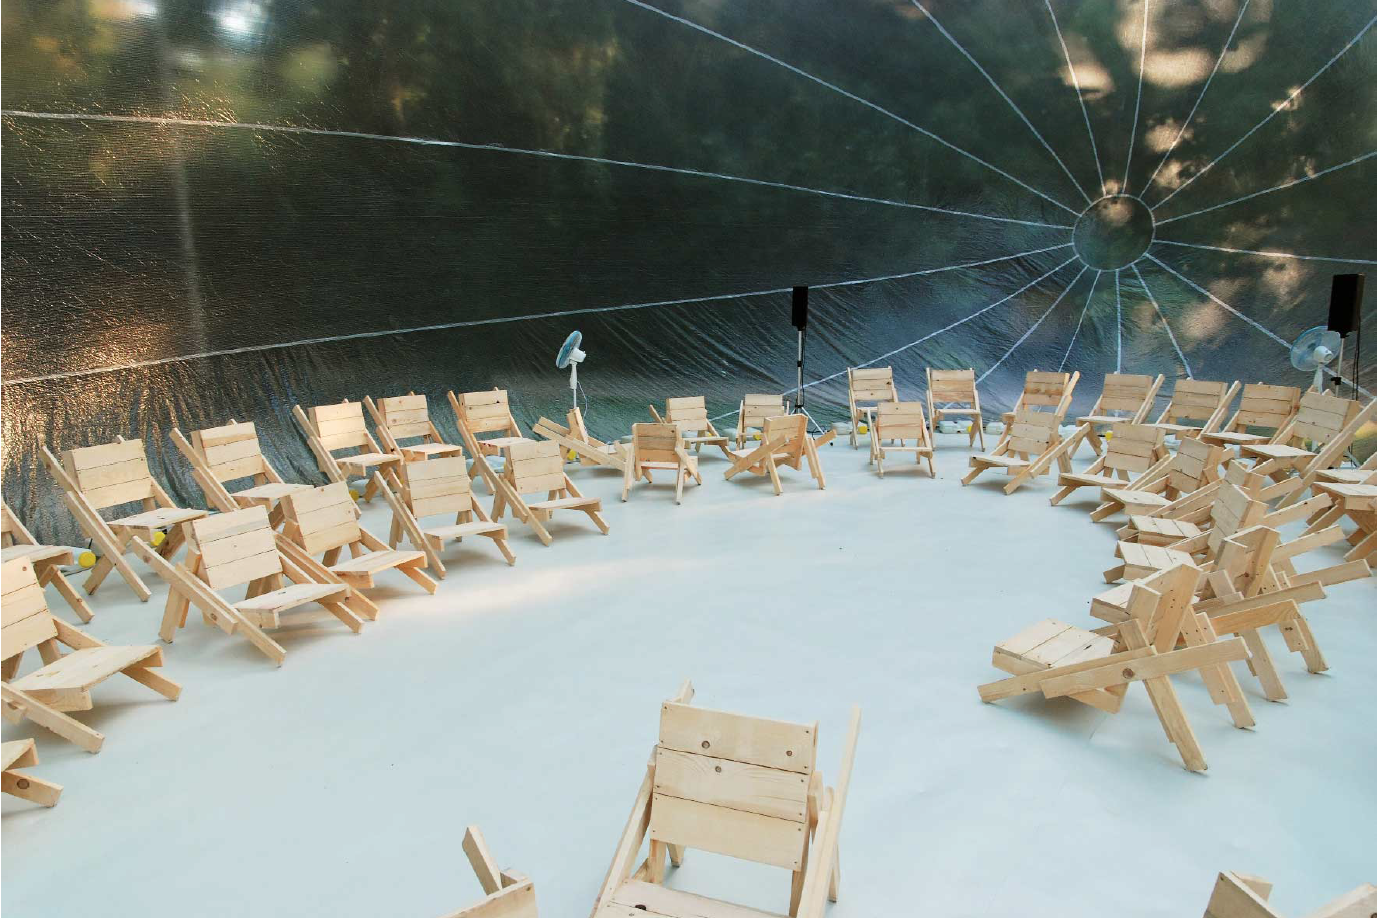 Spaces for Assemblies   Workshop at Akademie der Künste, Berlin